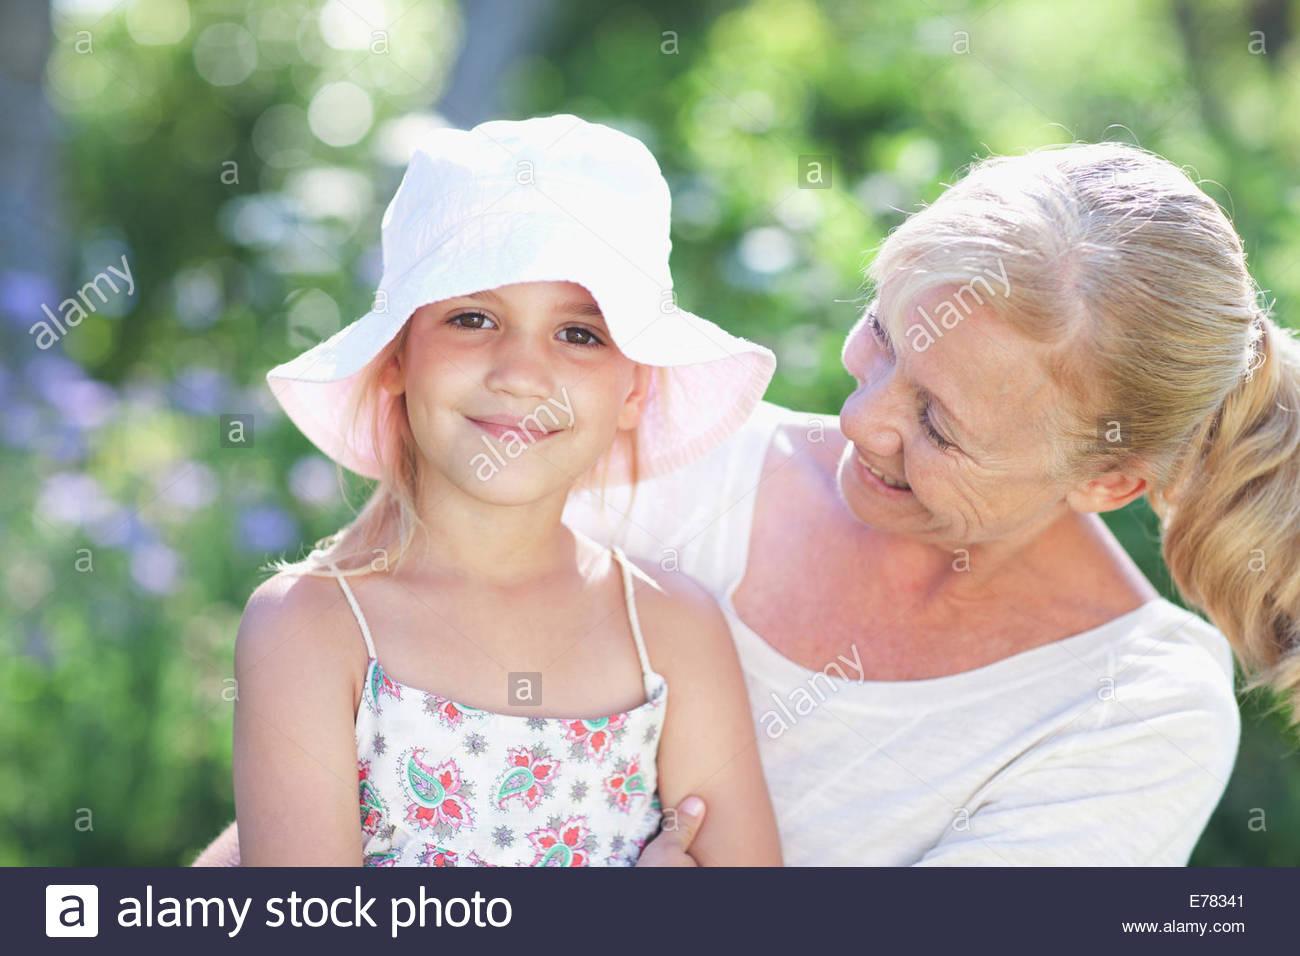 Großmutter und Enkelin im freien Stockbild